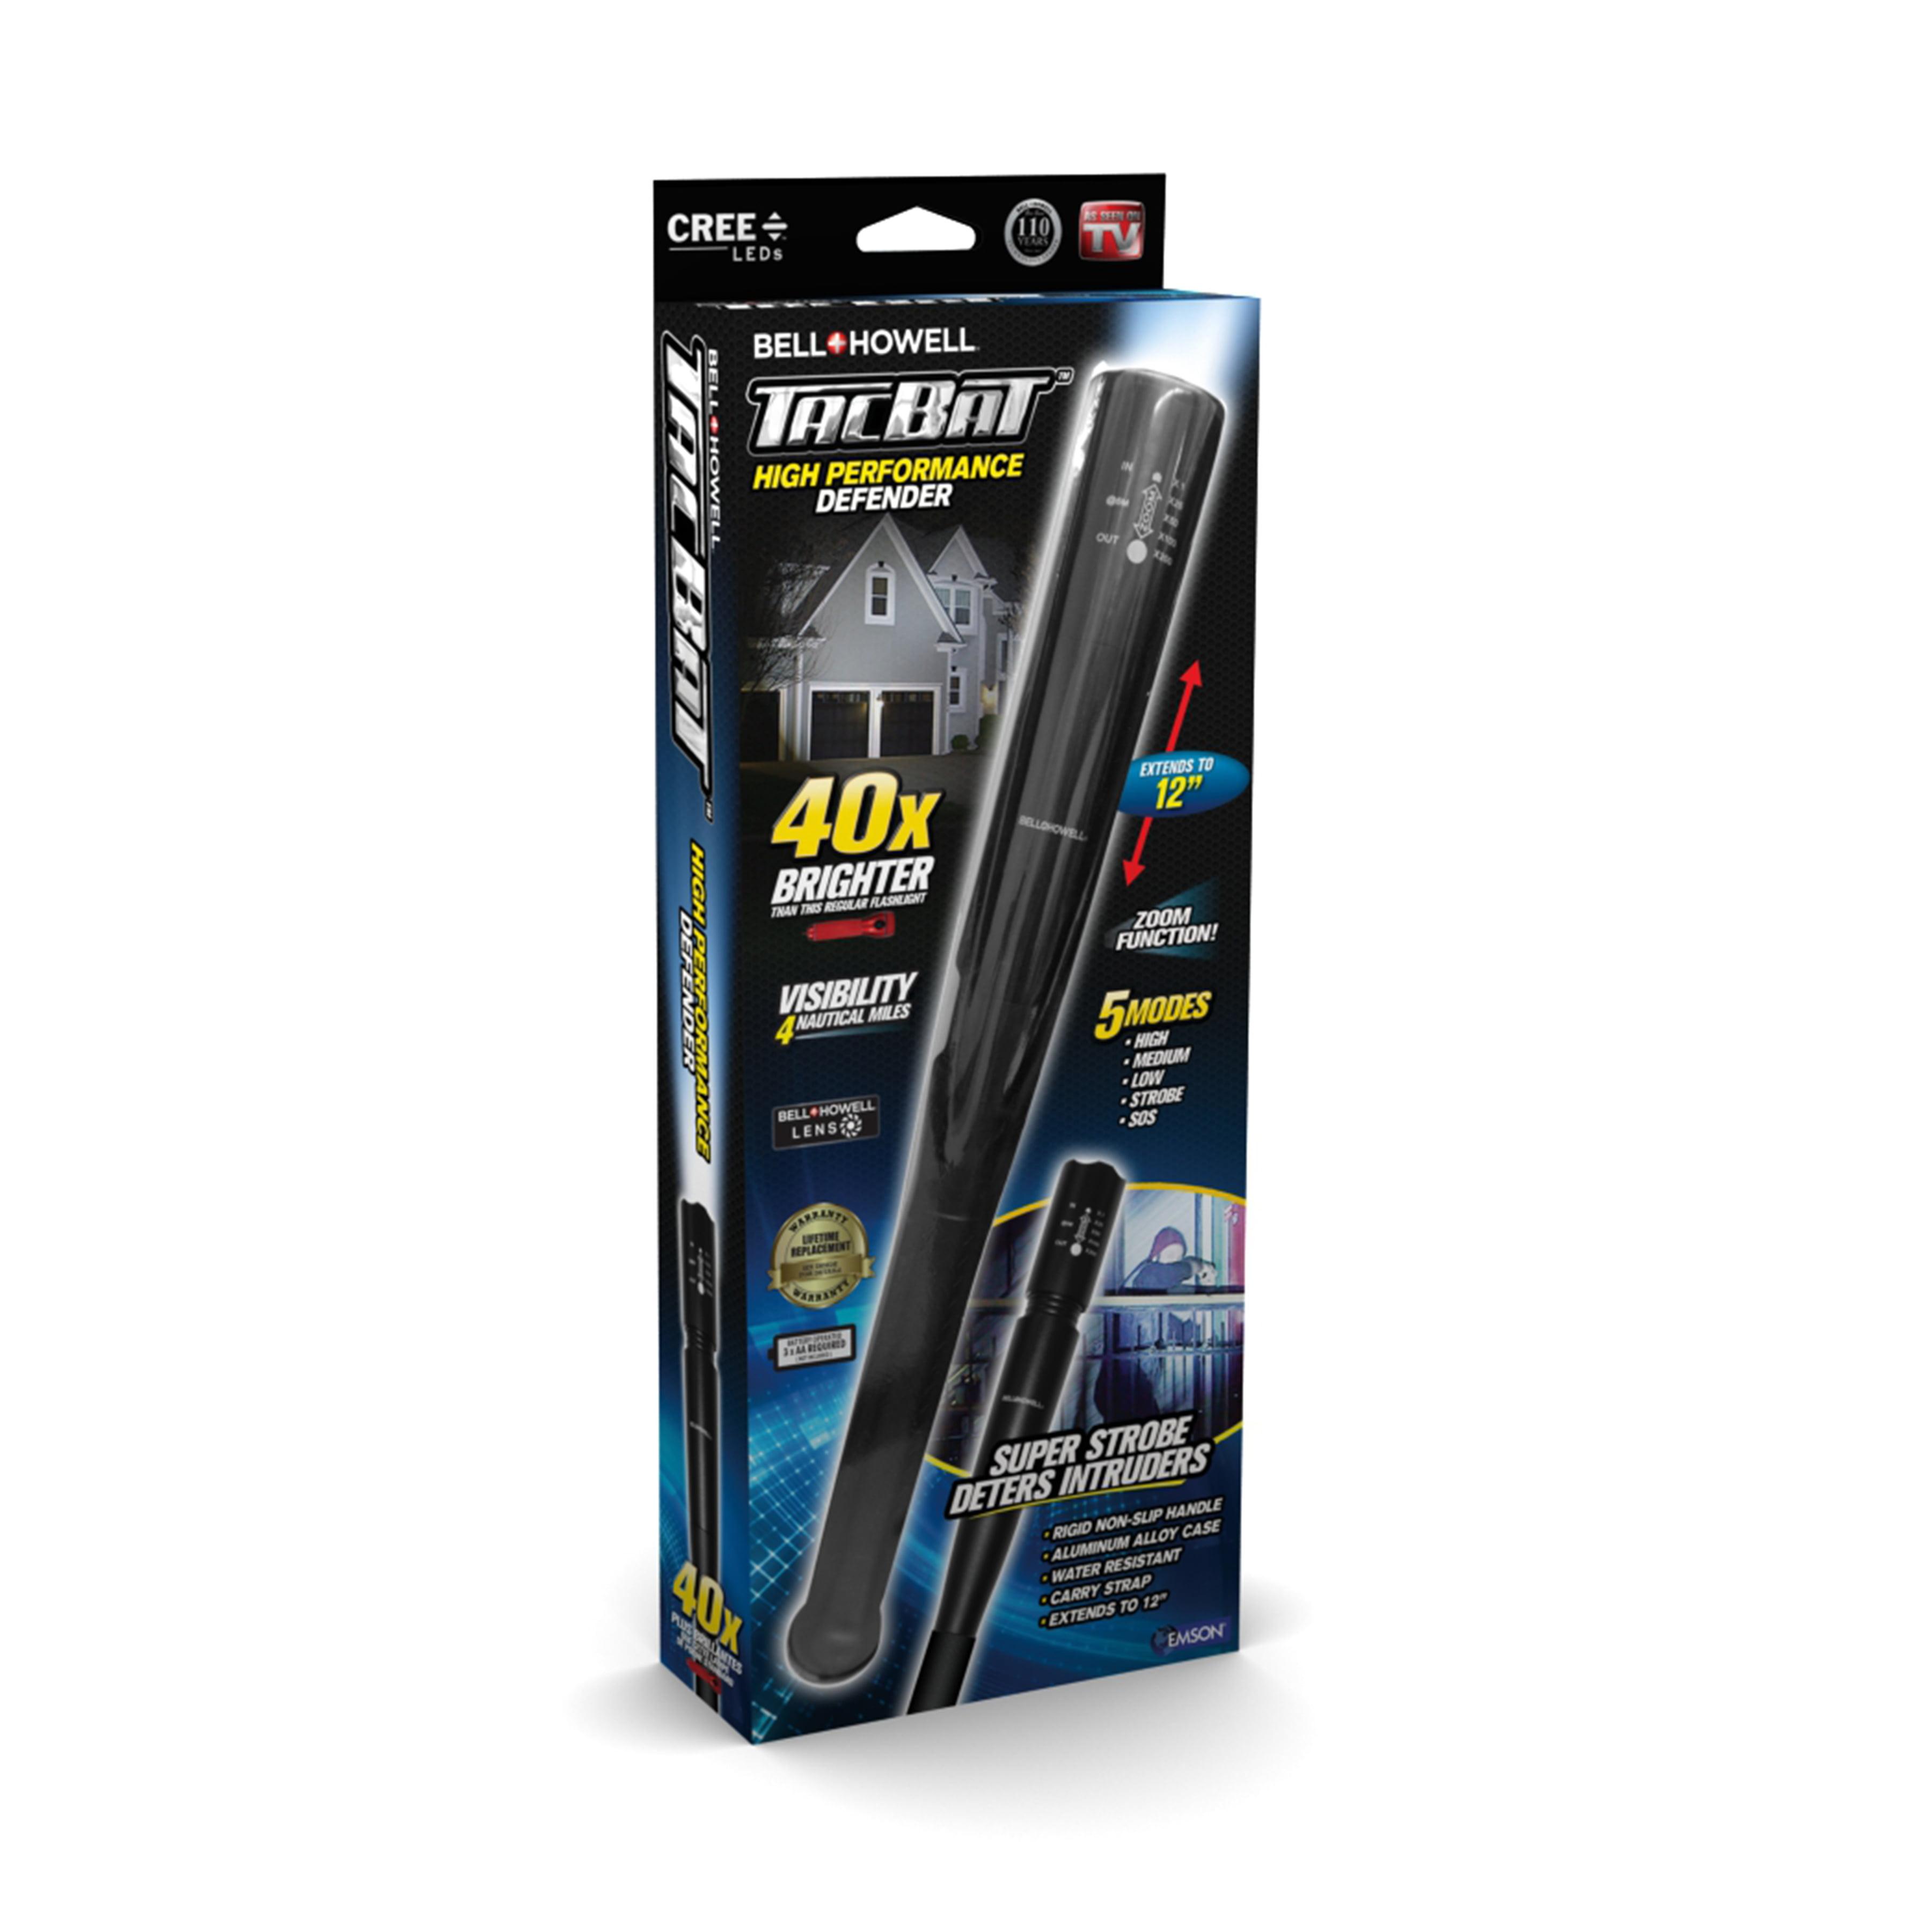 Bell + Howell Tac Bat Military Grade High Performance Tactical Flashlight & Bat, As Seen on TV! Black